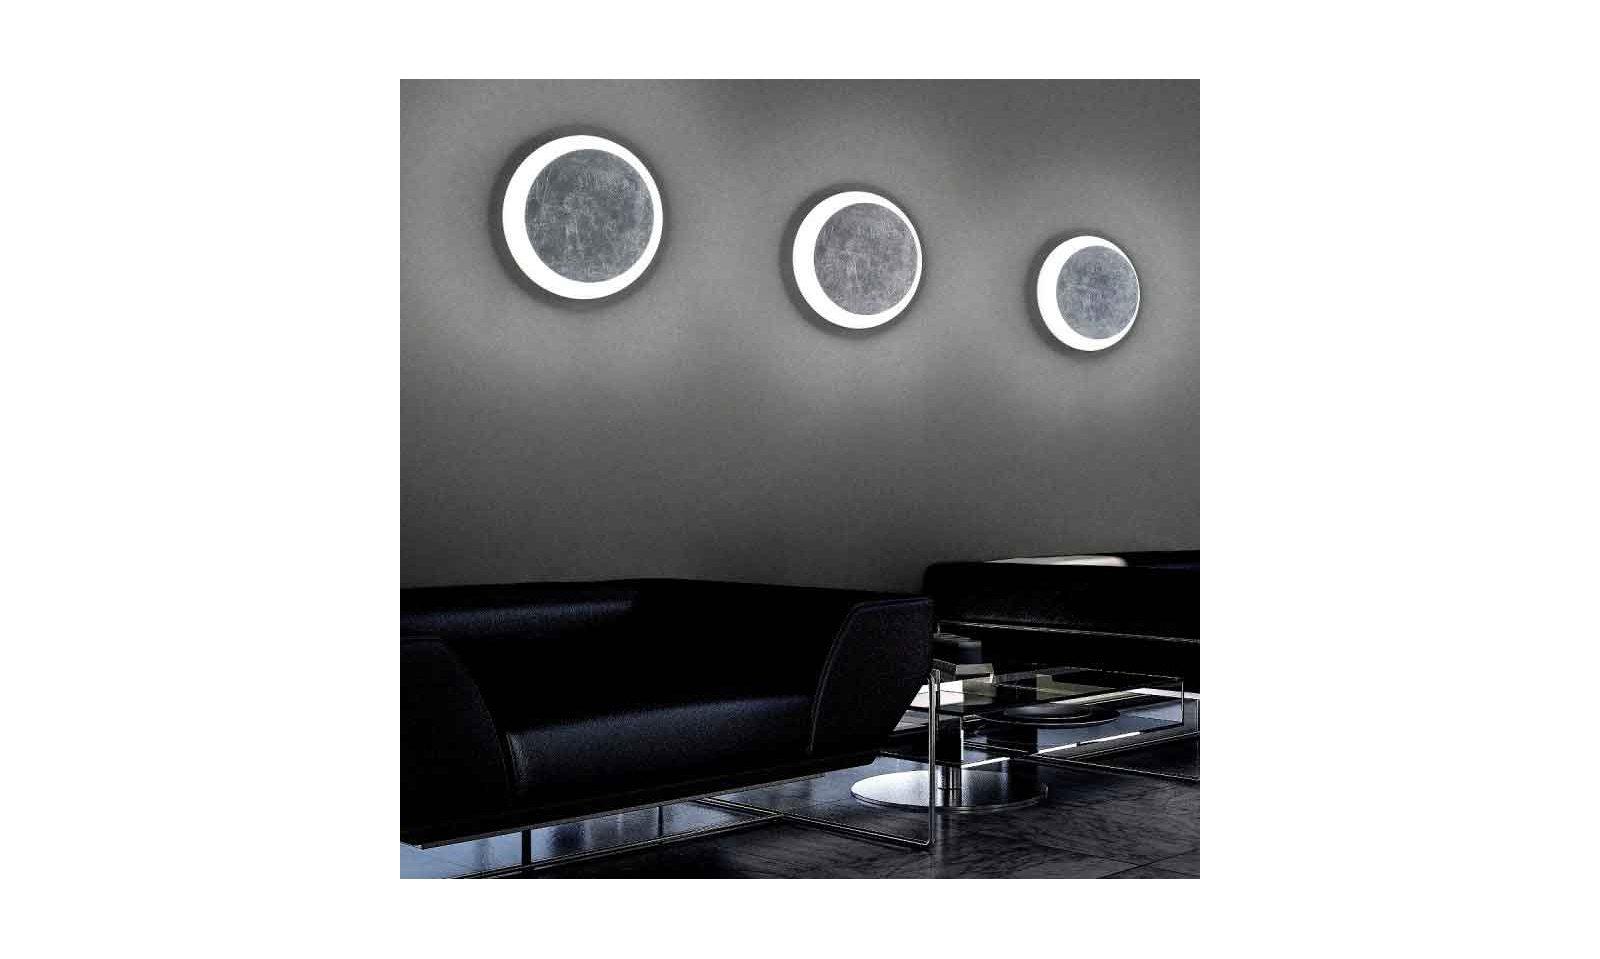 Braga illuminazione applique rotary led lampada da parete led